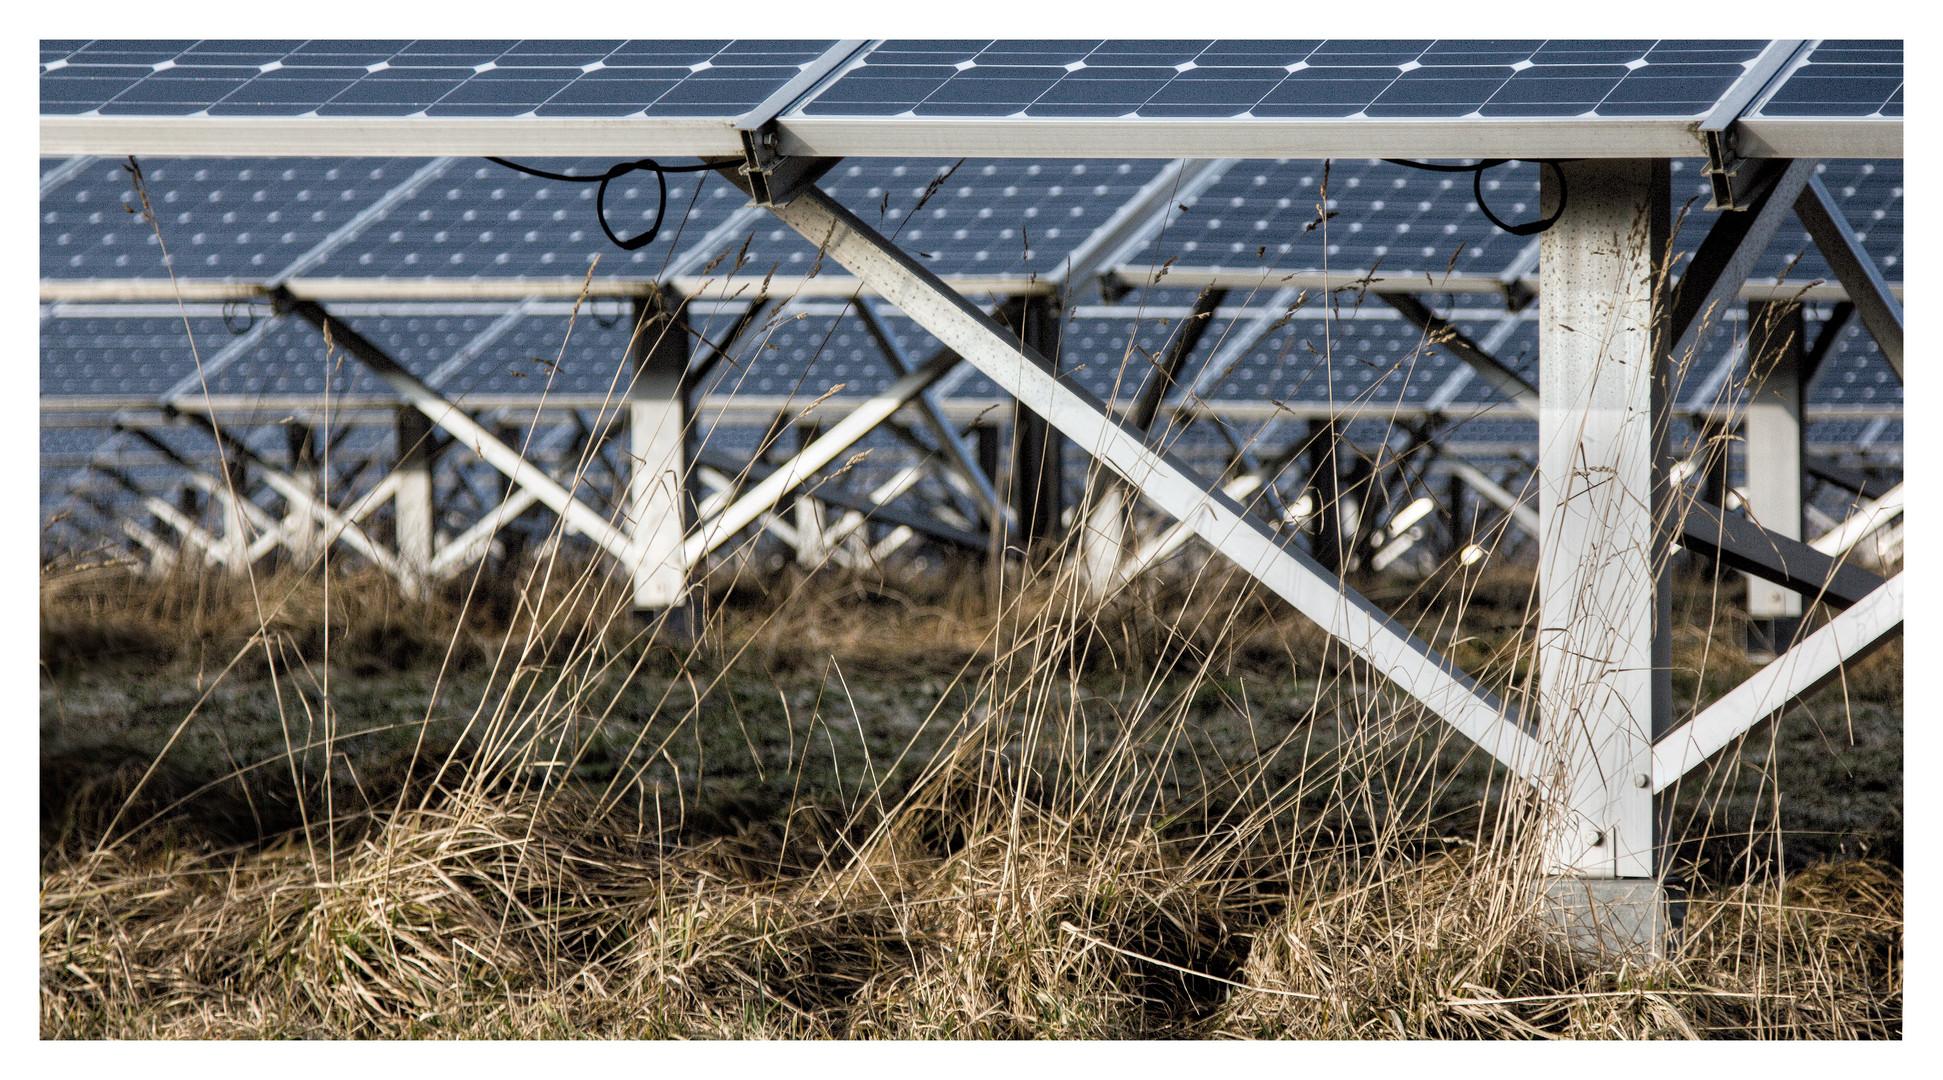 Solarpark II